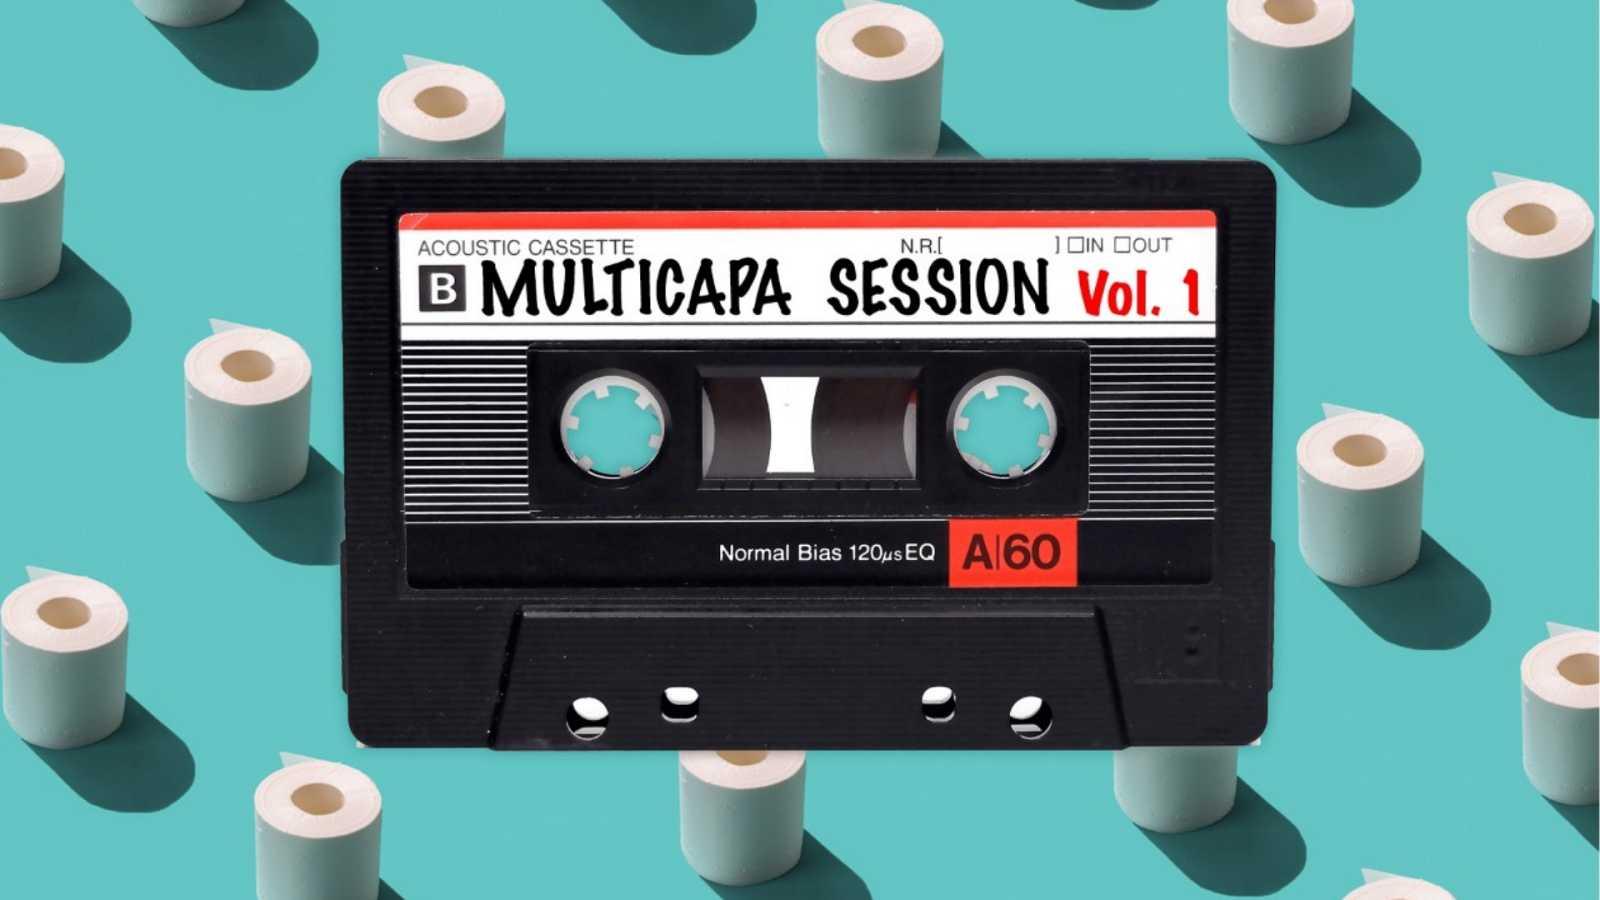 Fallo de sistema - 432: Multicapa Session - 27/12/20 - escuchar ahora